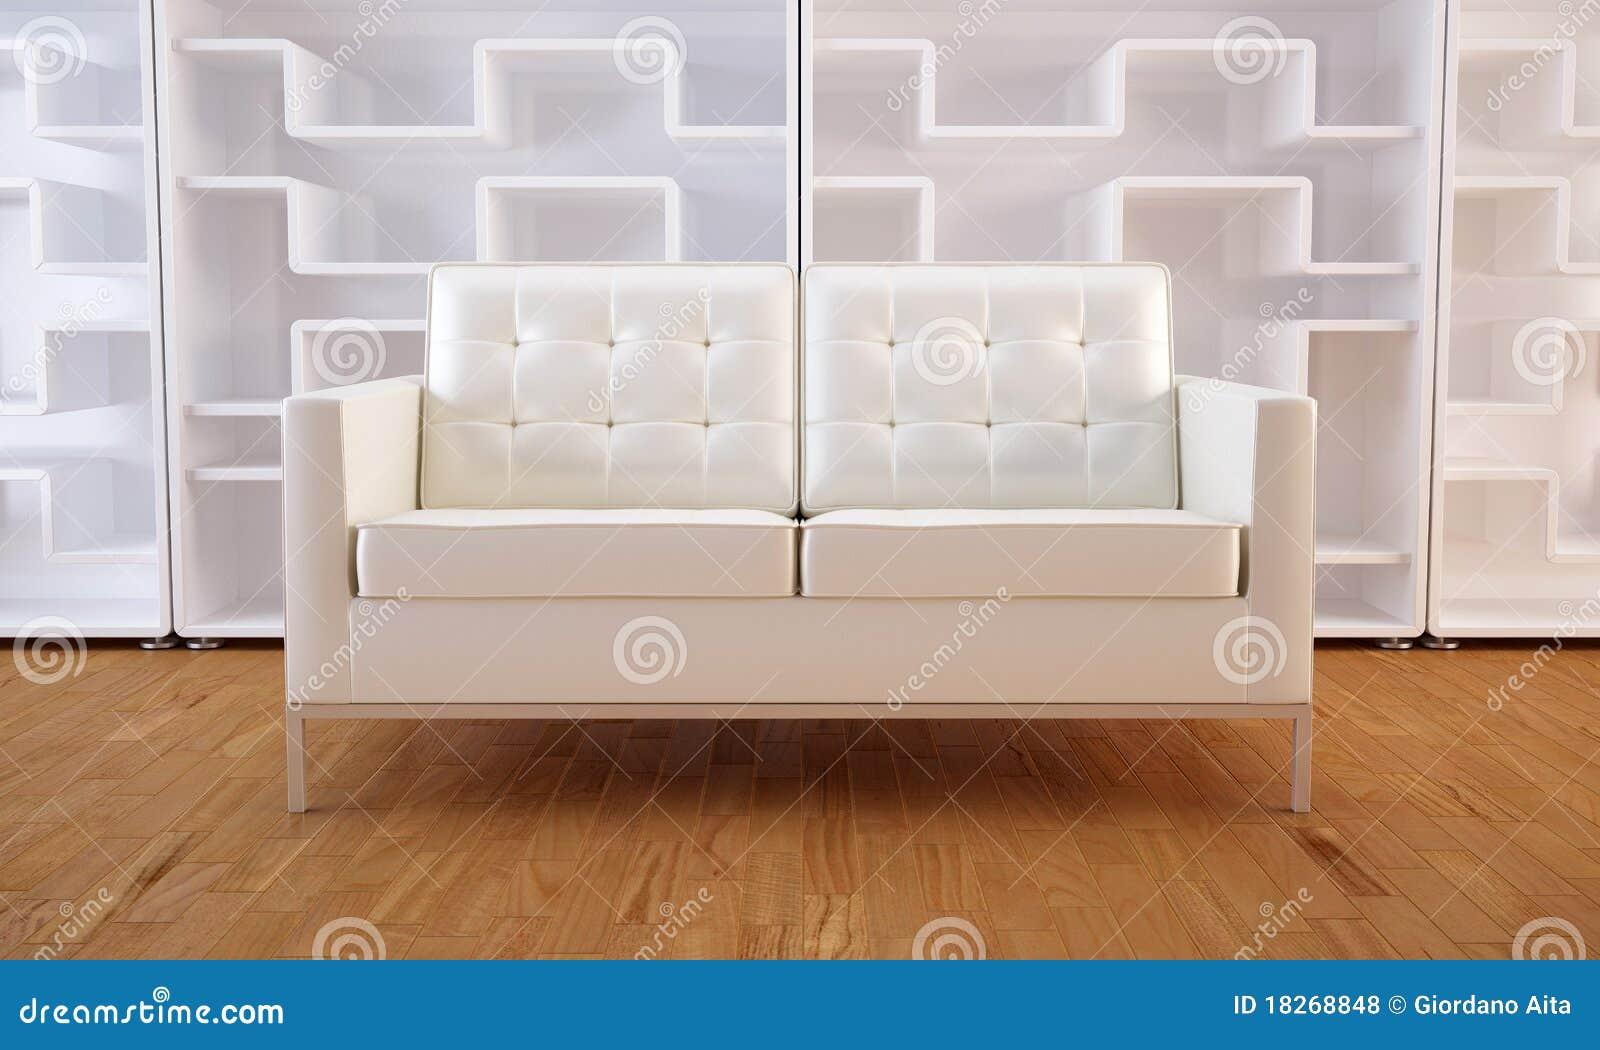 Gamma Witte Planken.Abc Quadrant Boekenkast Lundia Designkasten Landelijke Boekenkast